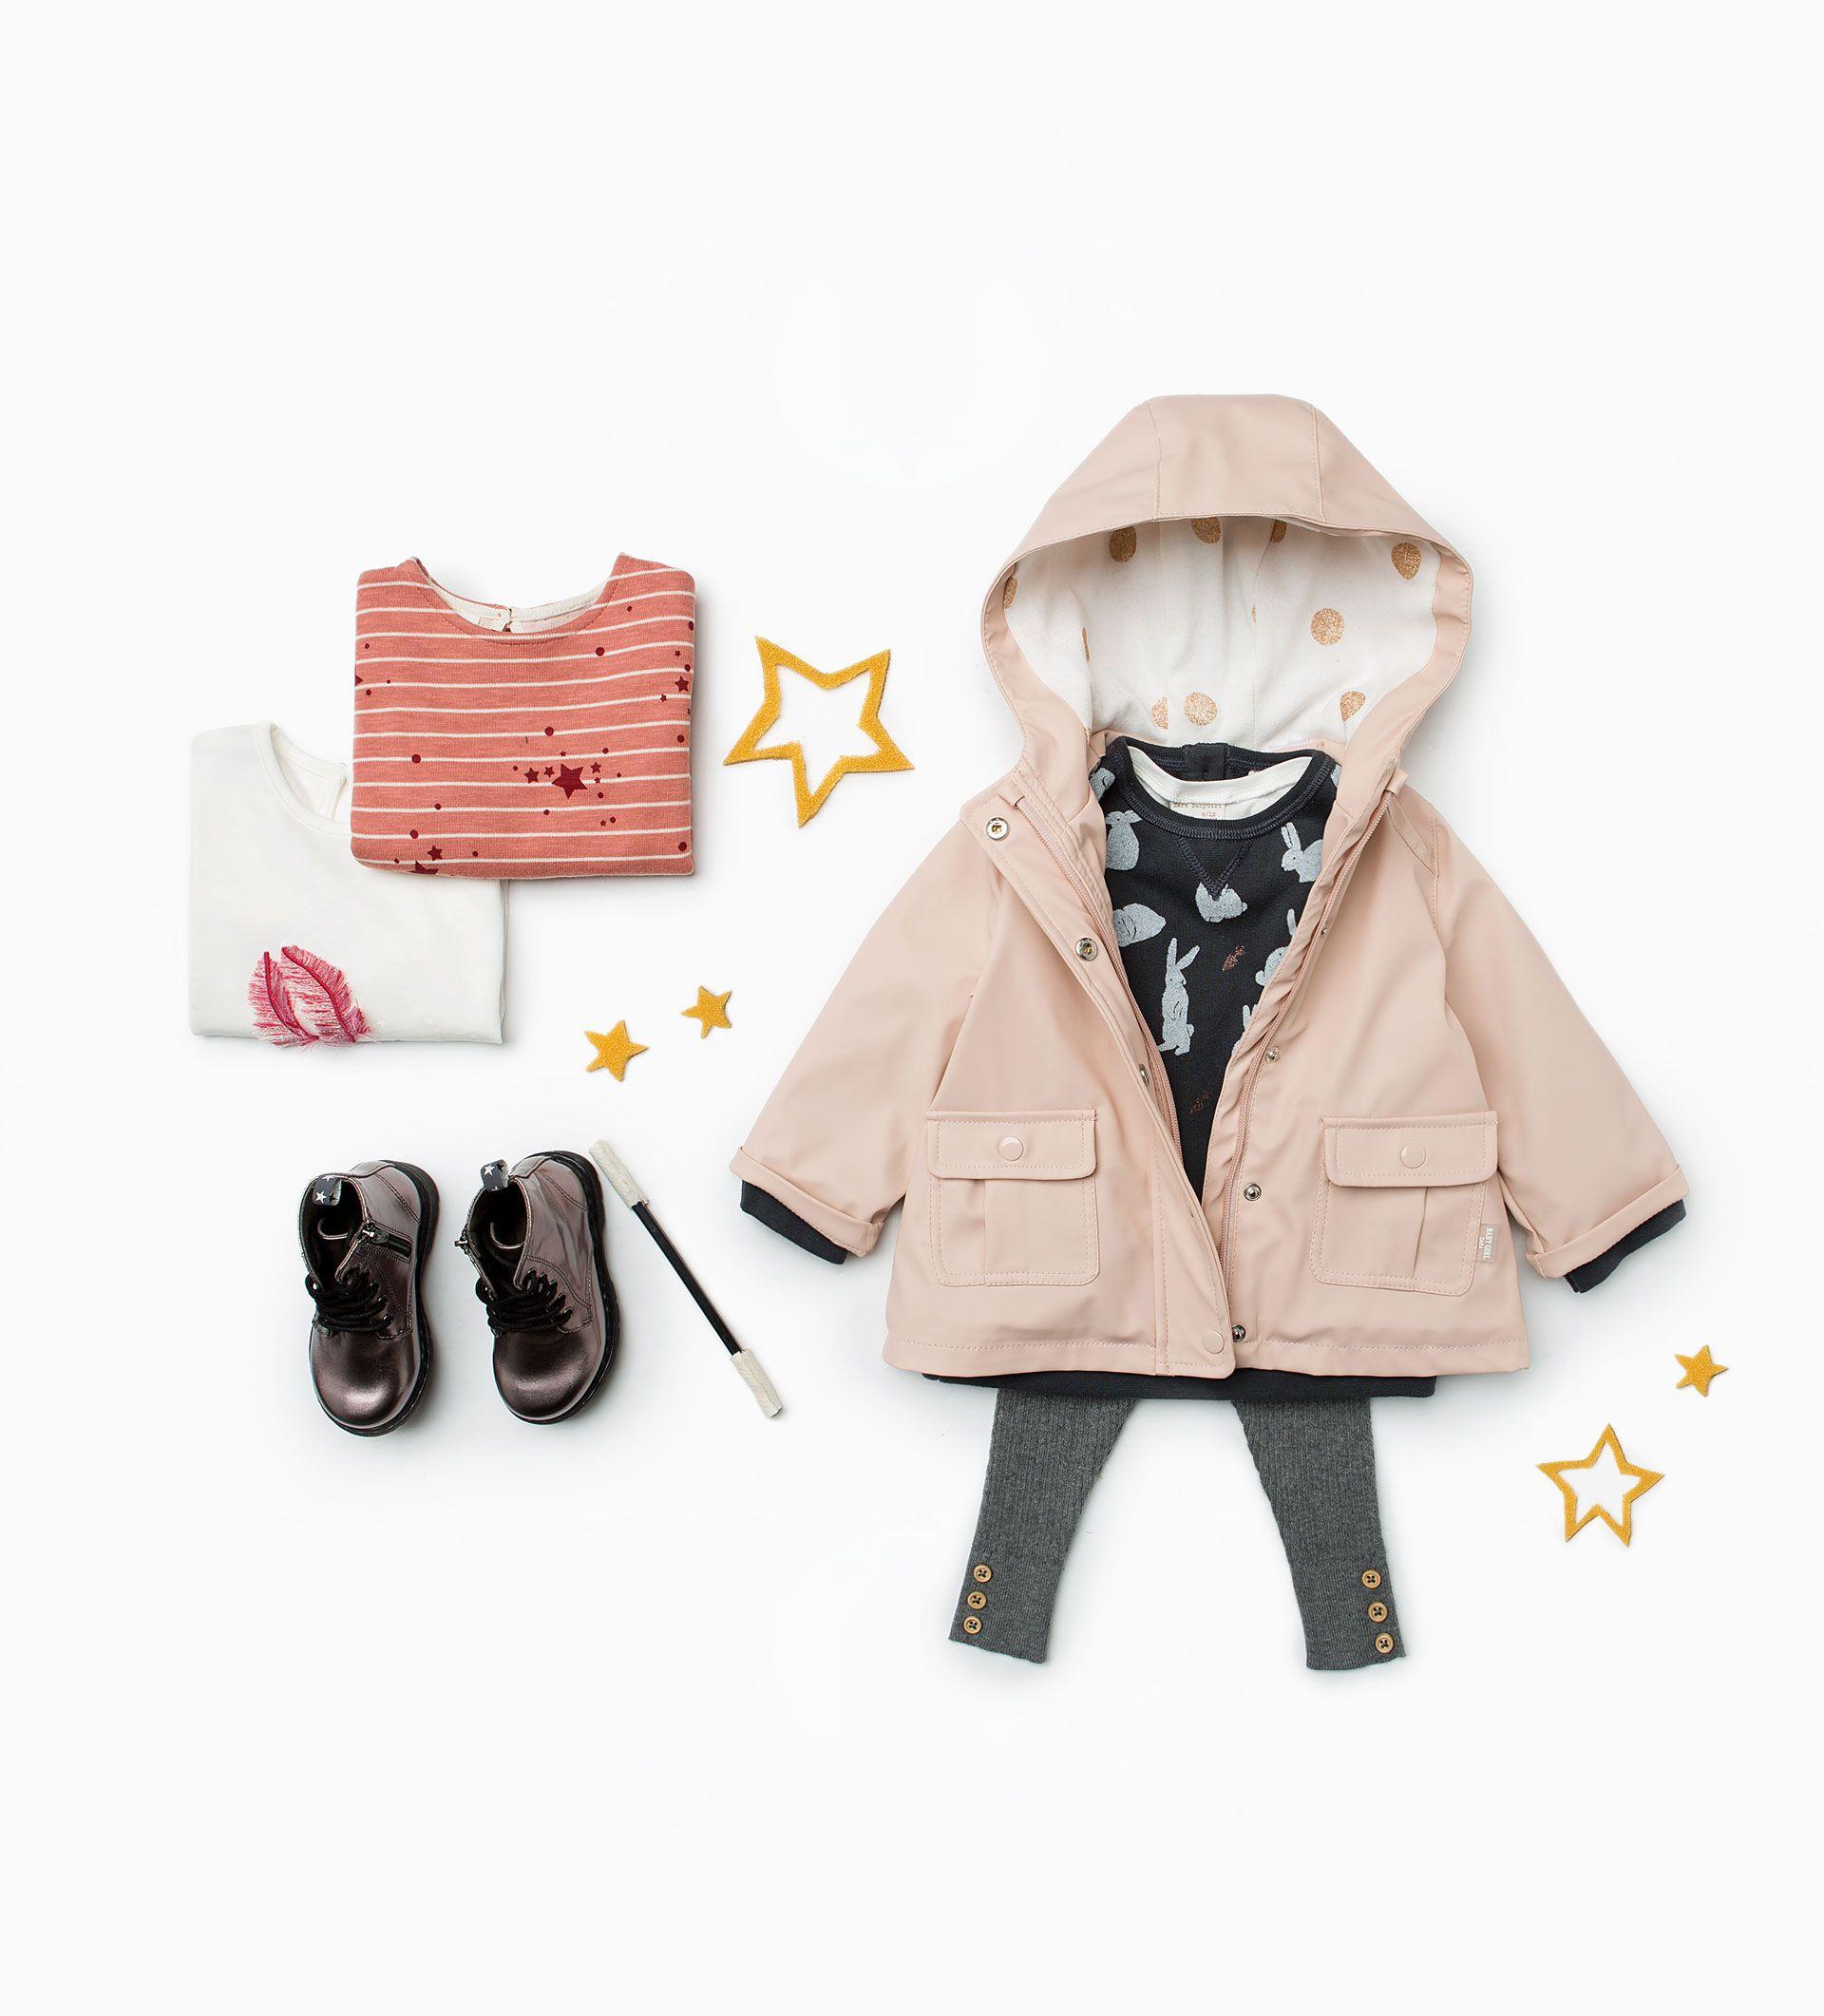 Image 1 of from Zara | Mini | Zara baby, Zara kids, Baby ...